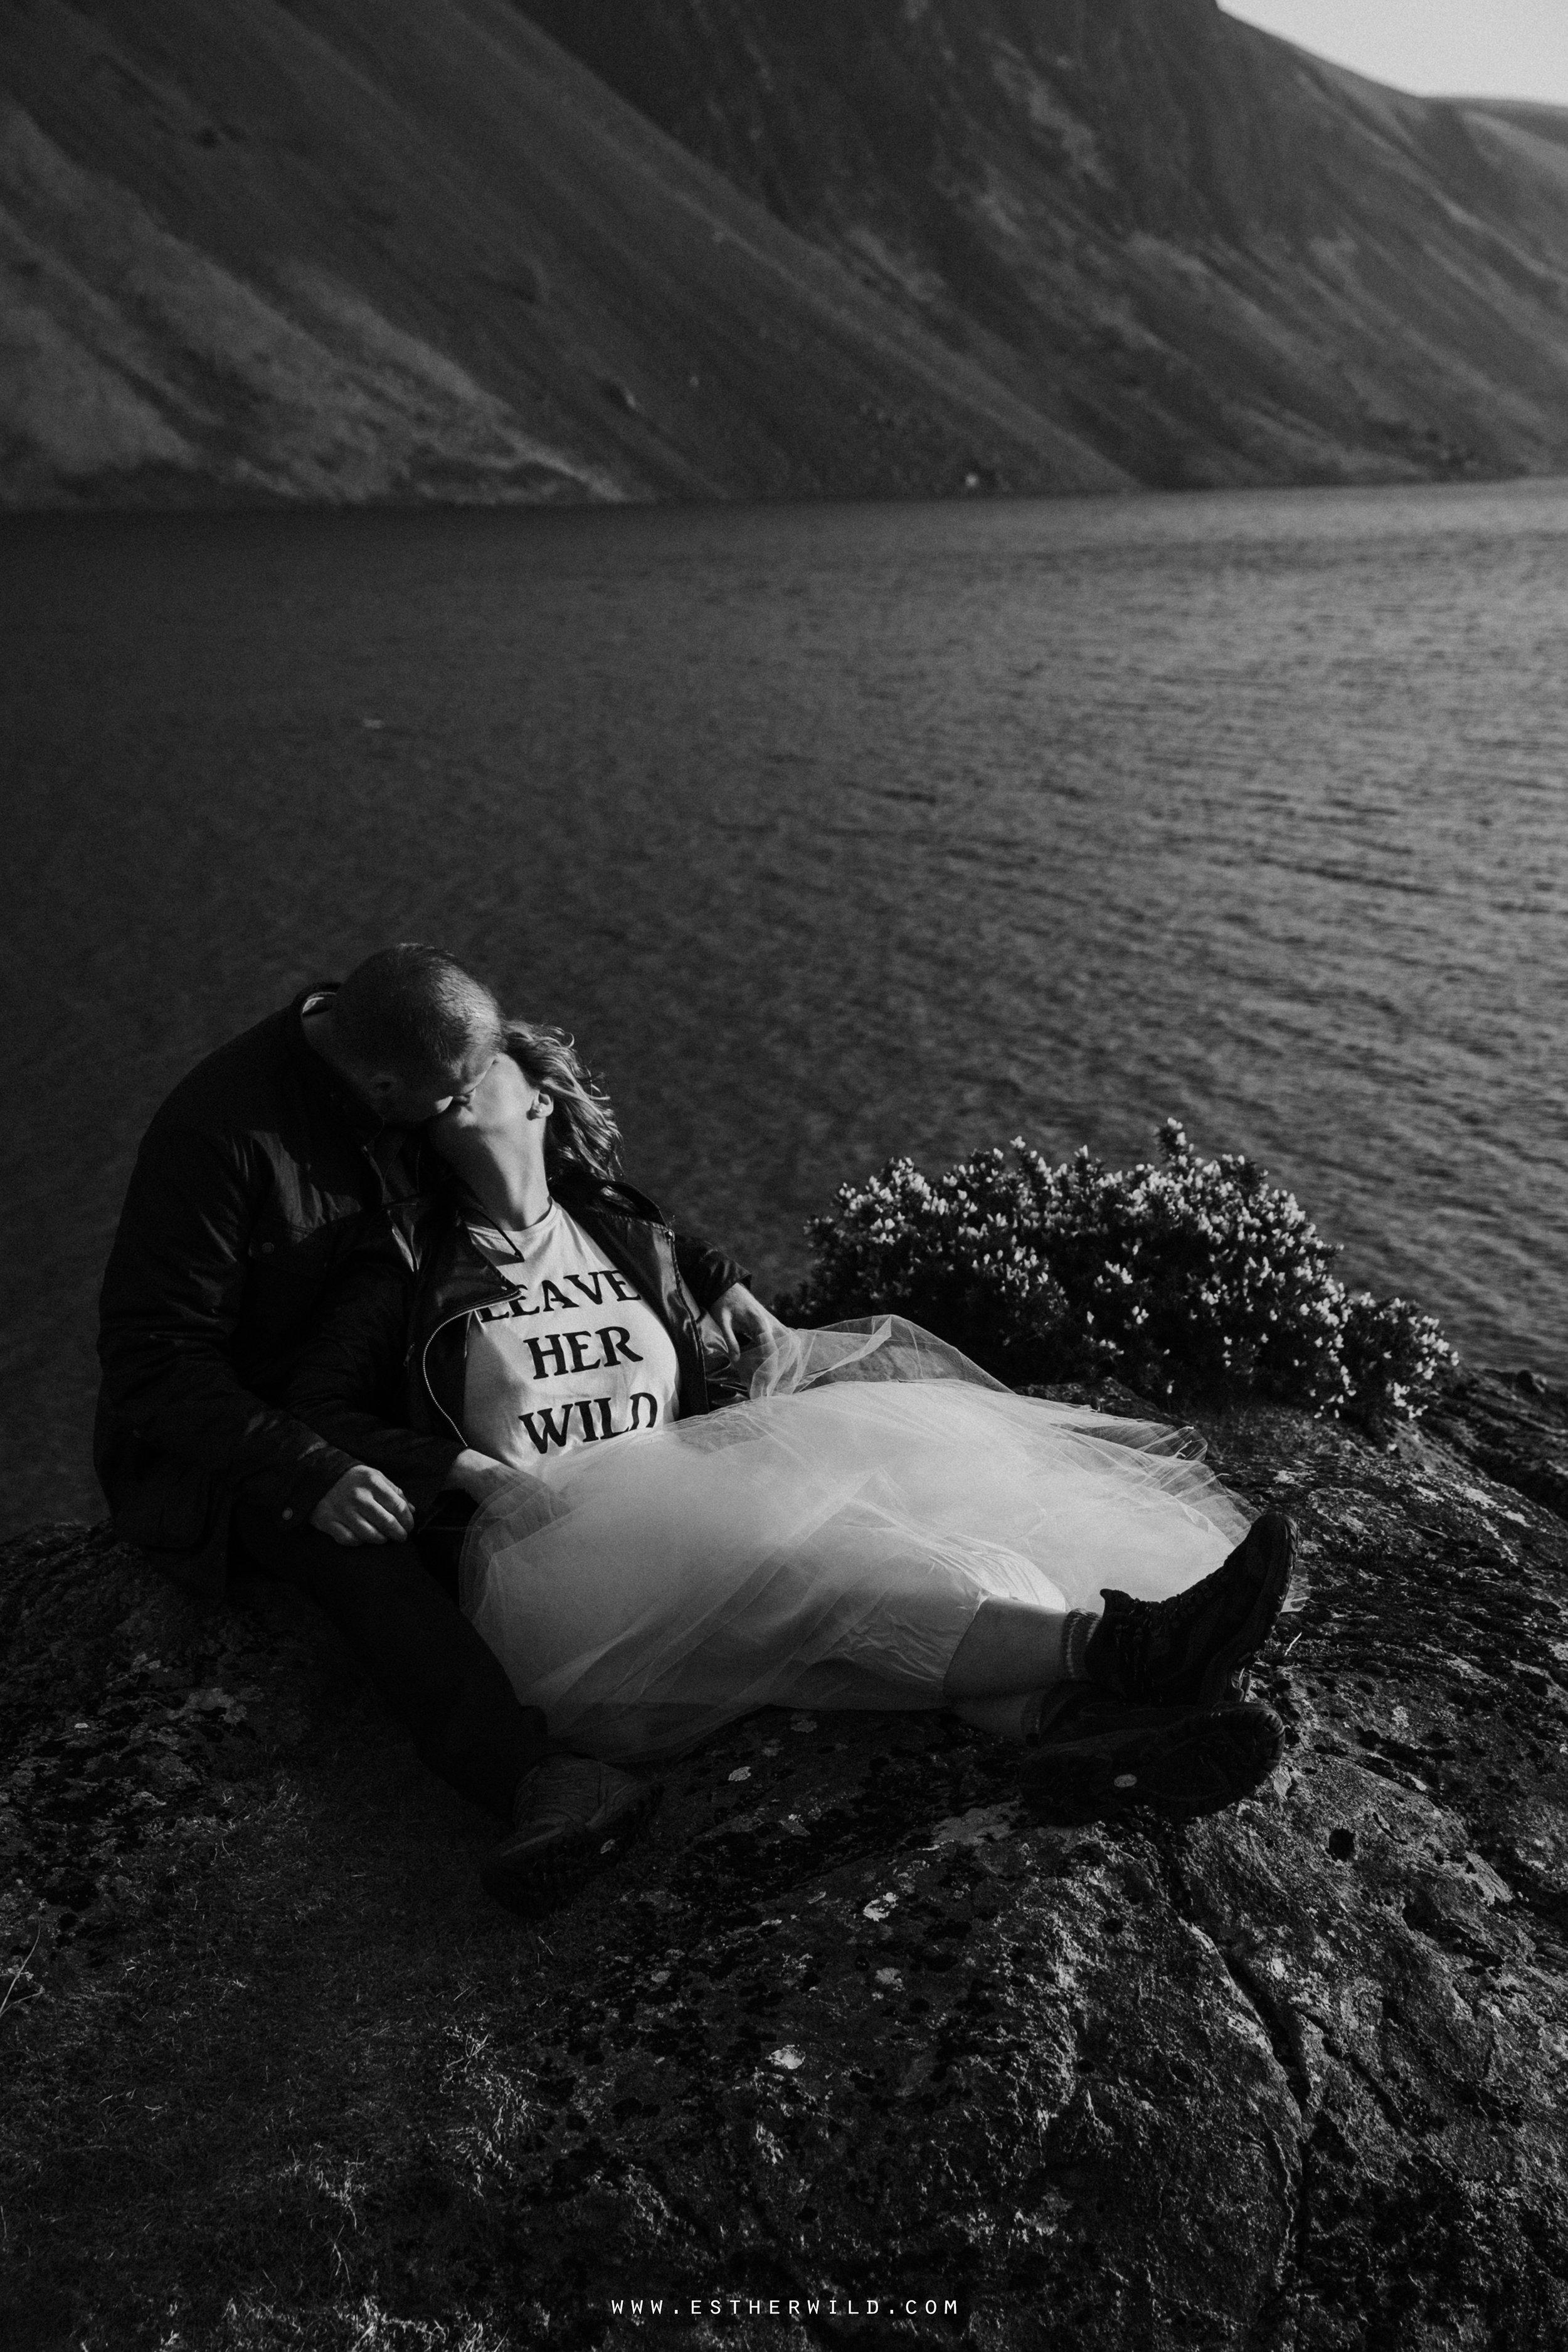 Cumbria_Lake_District_Wasdale_Wedding_Photographer_Destination_Engagement_Anniversary_Esther_Wild_IMG_4539.jpg